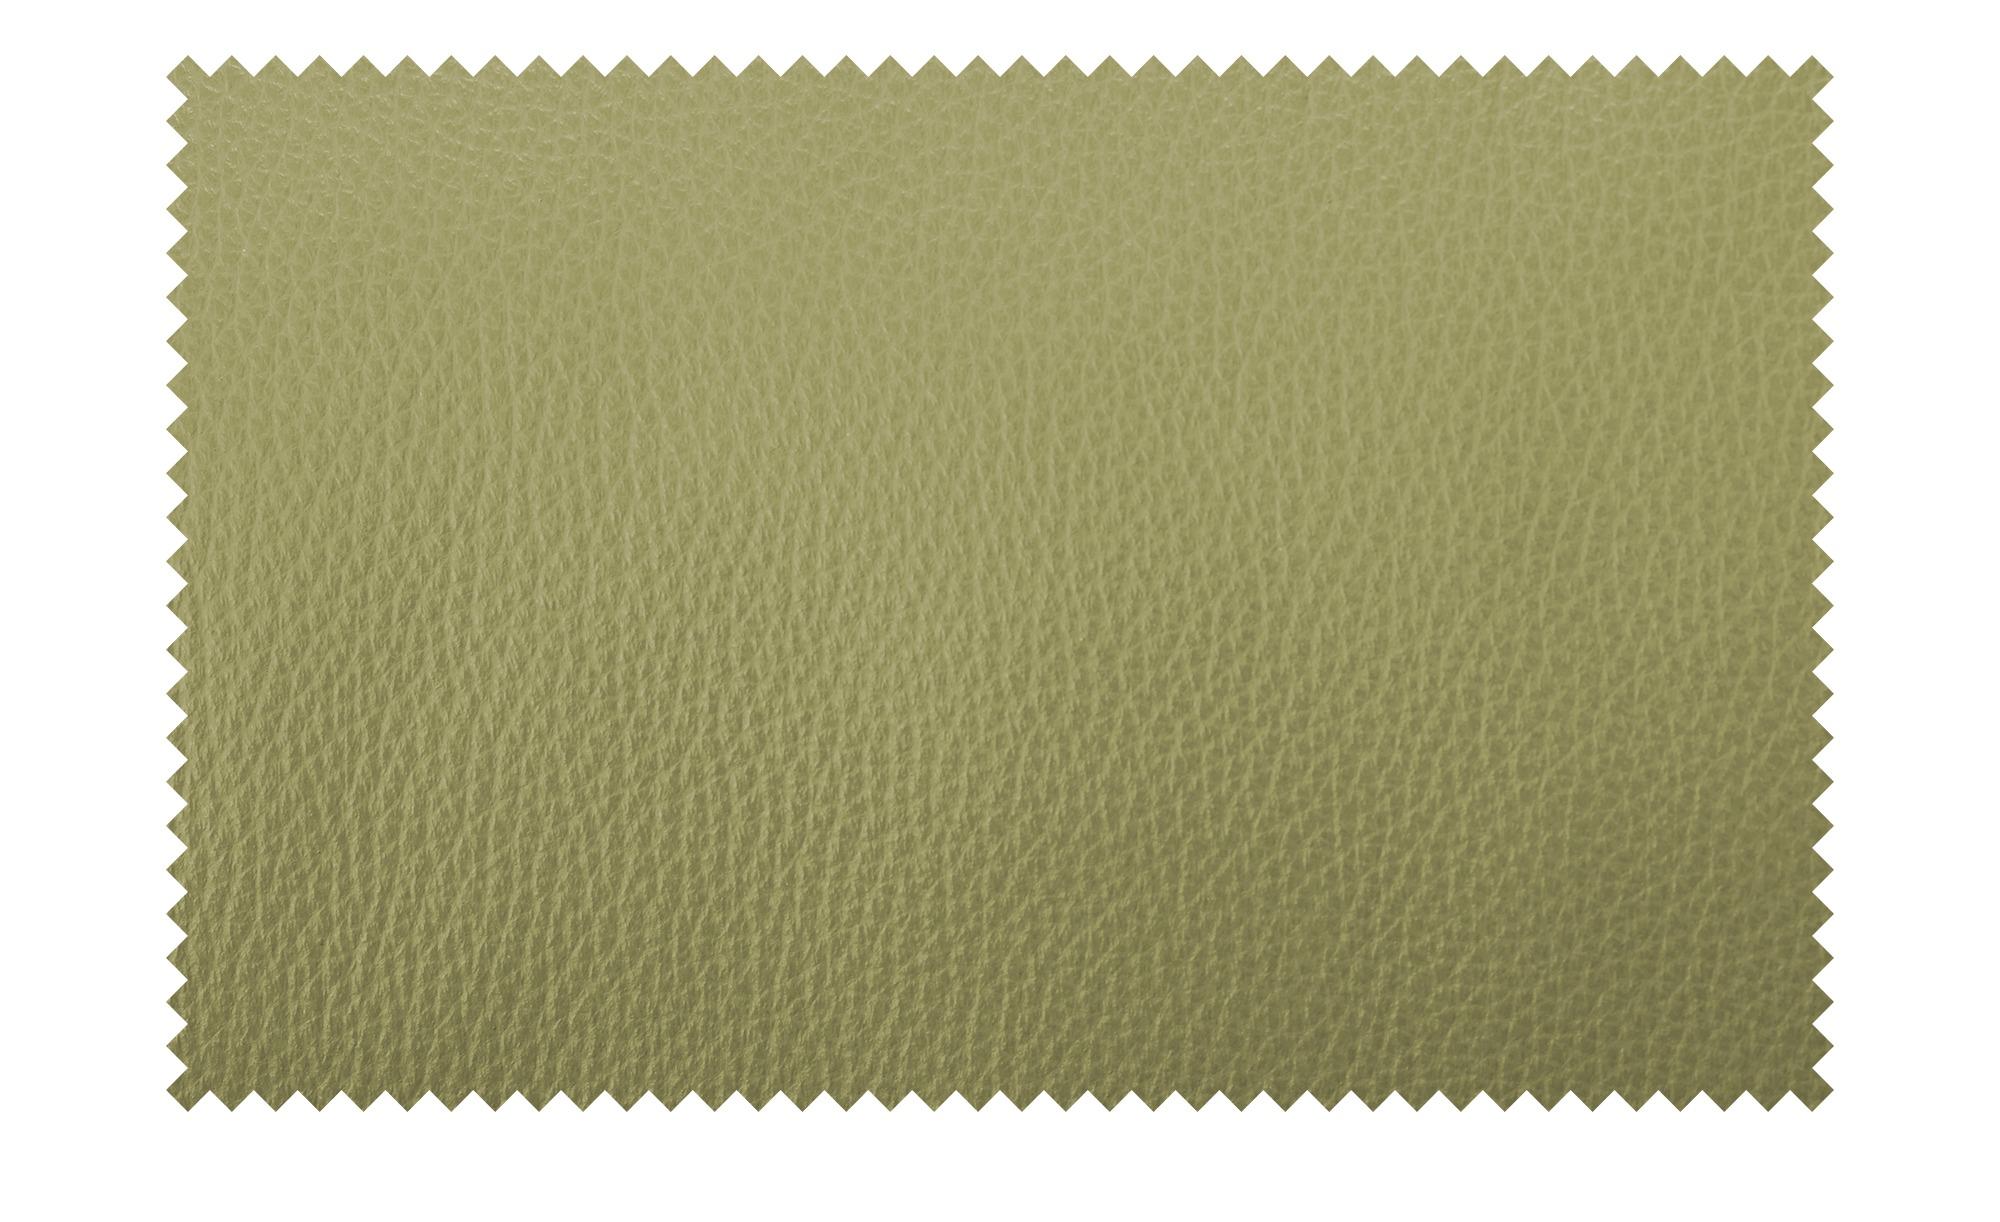 Nils Olsen Funktionssessel  Arend ¦ grün ¦ Maße (cm): B: 71 H: 118 T: 87 Polstermöbel > Sessel > Drehsessel - Höffner